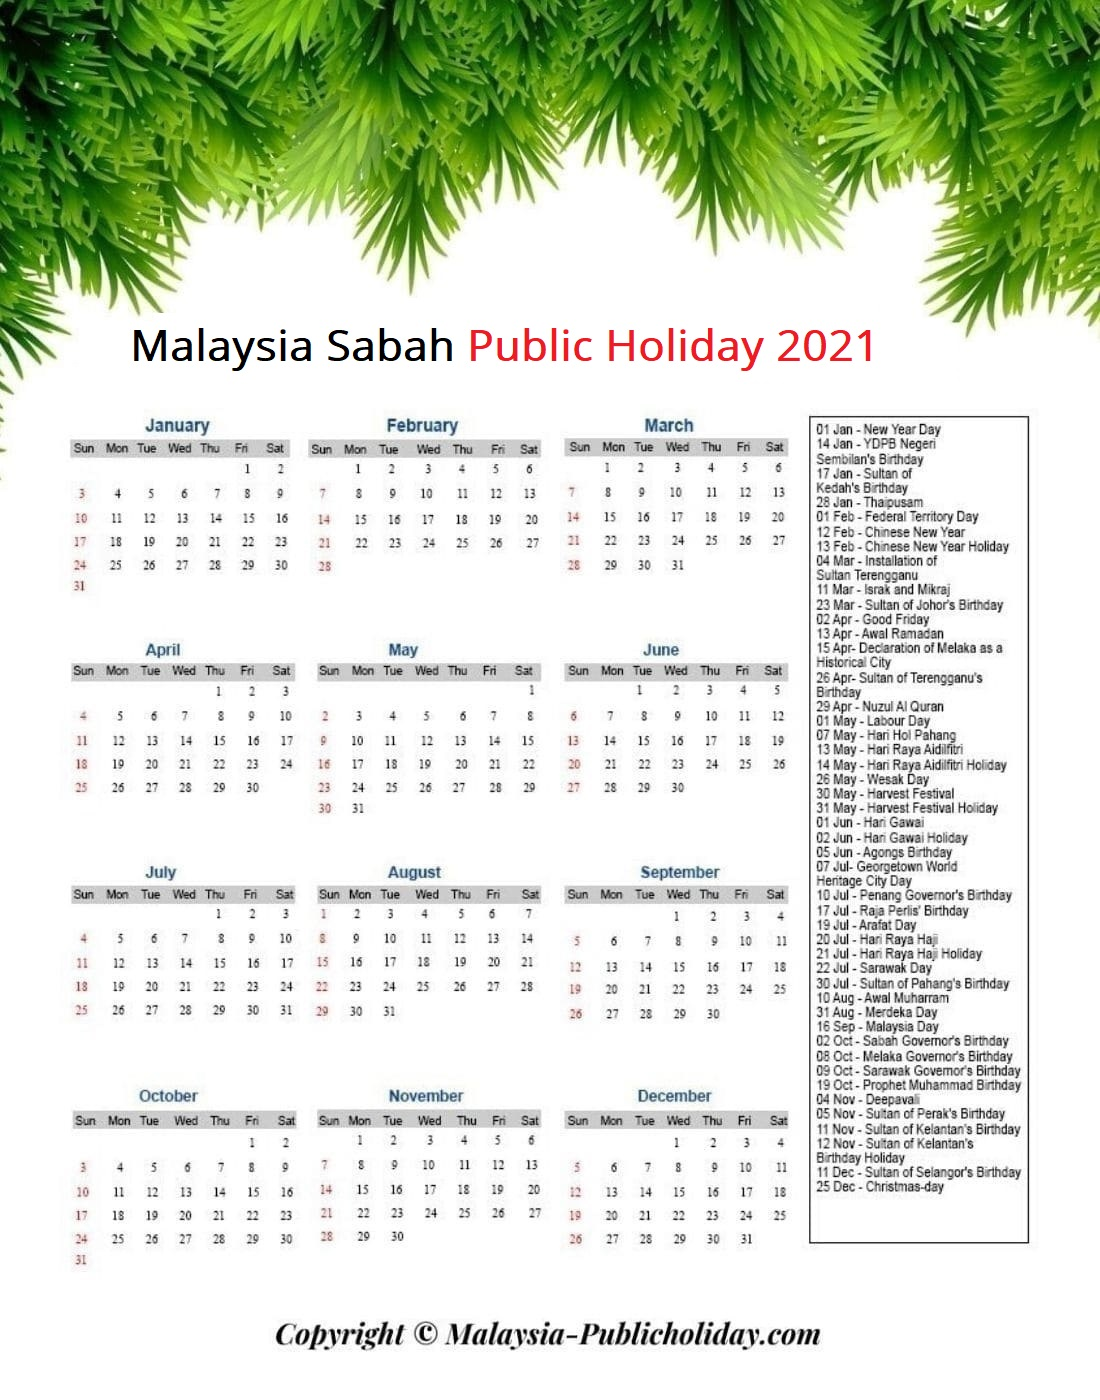 Sabah Holiday 2021 Malaysia